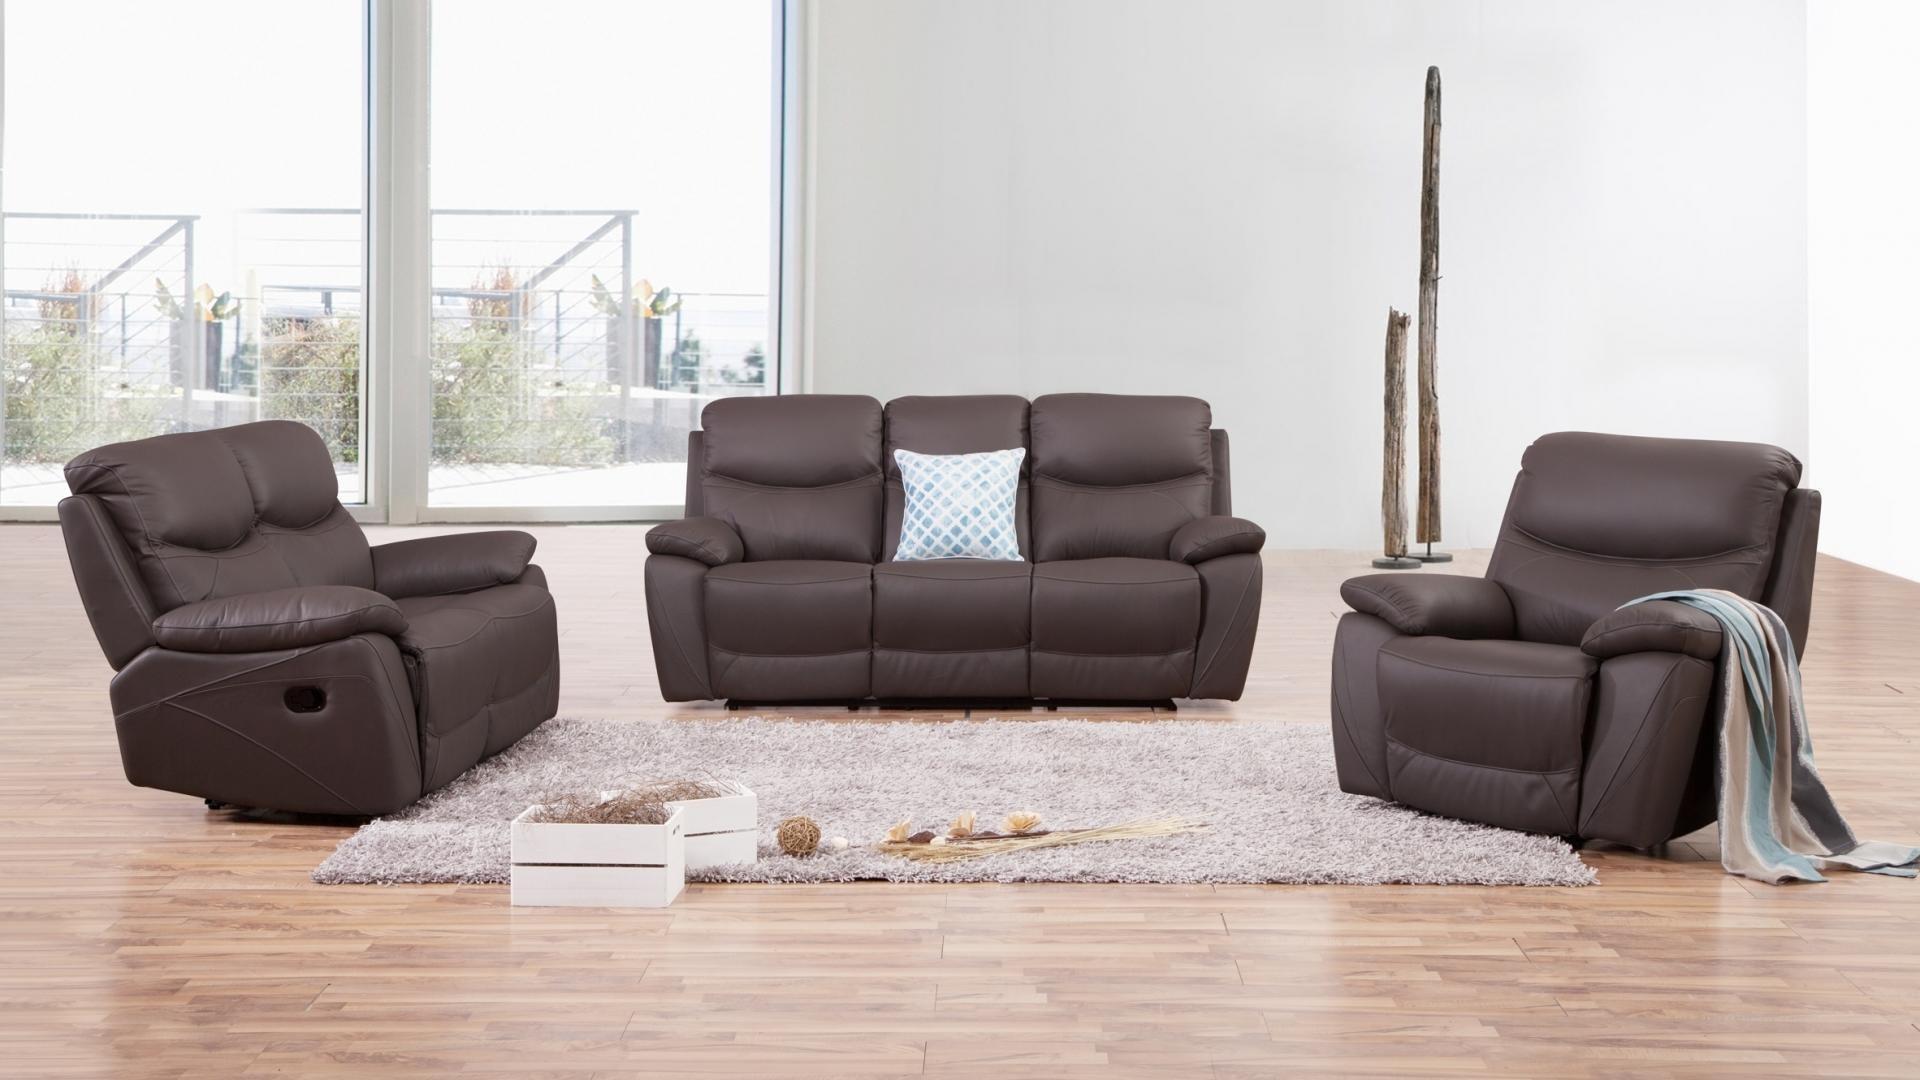 chelsea leather recliner sofa suite 3 2 1 lounge life. Black Bedroom Furniture Sets. Home Design Ideas